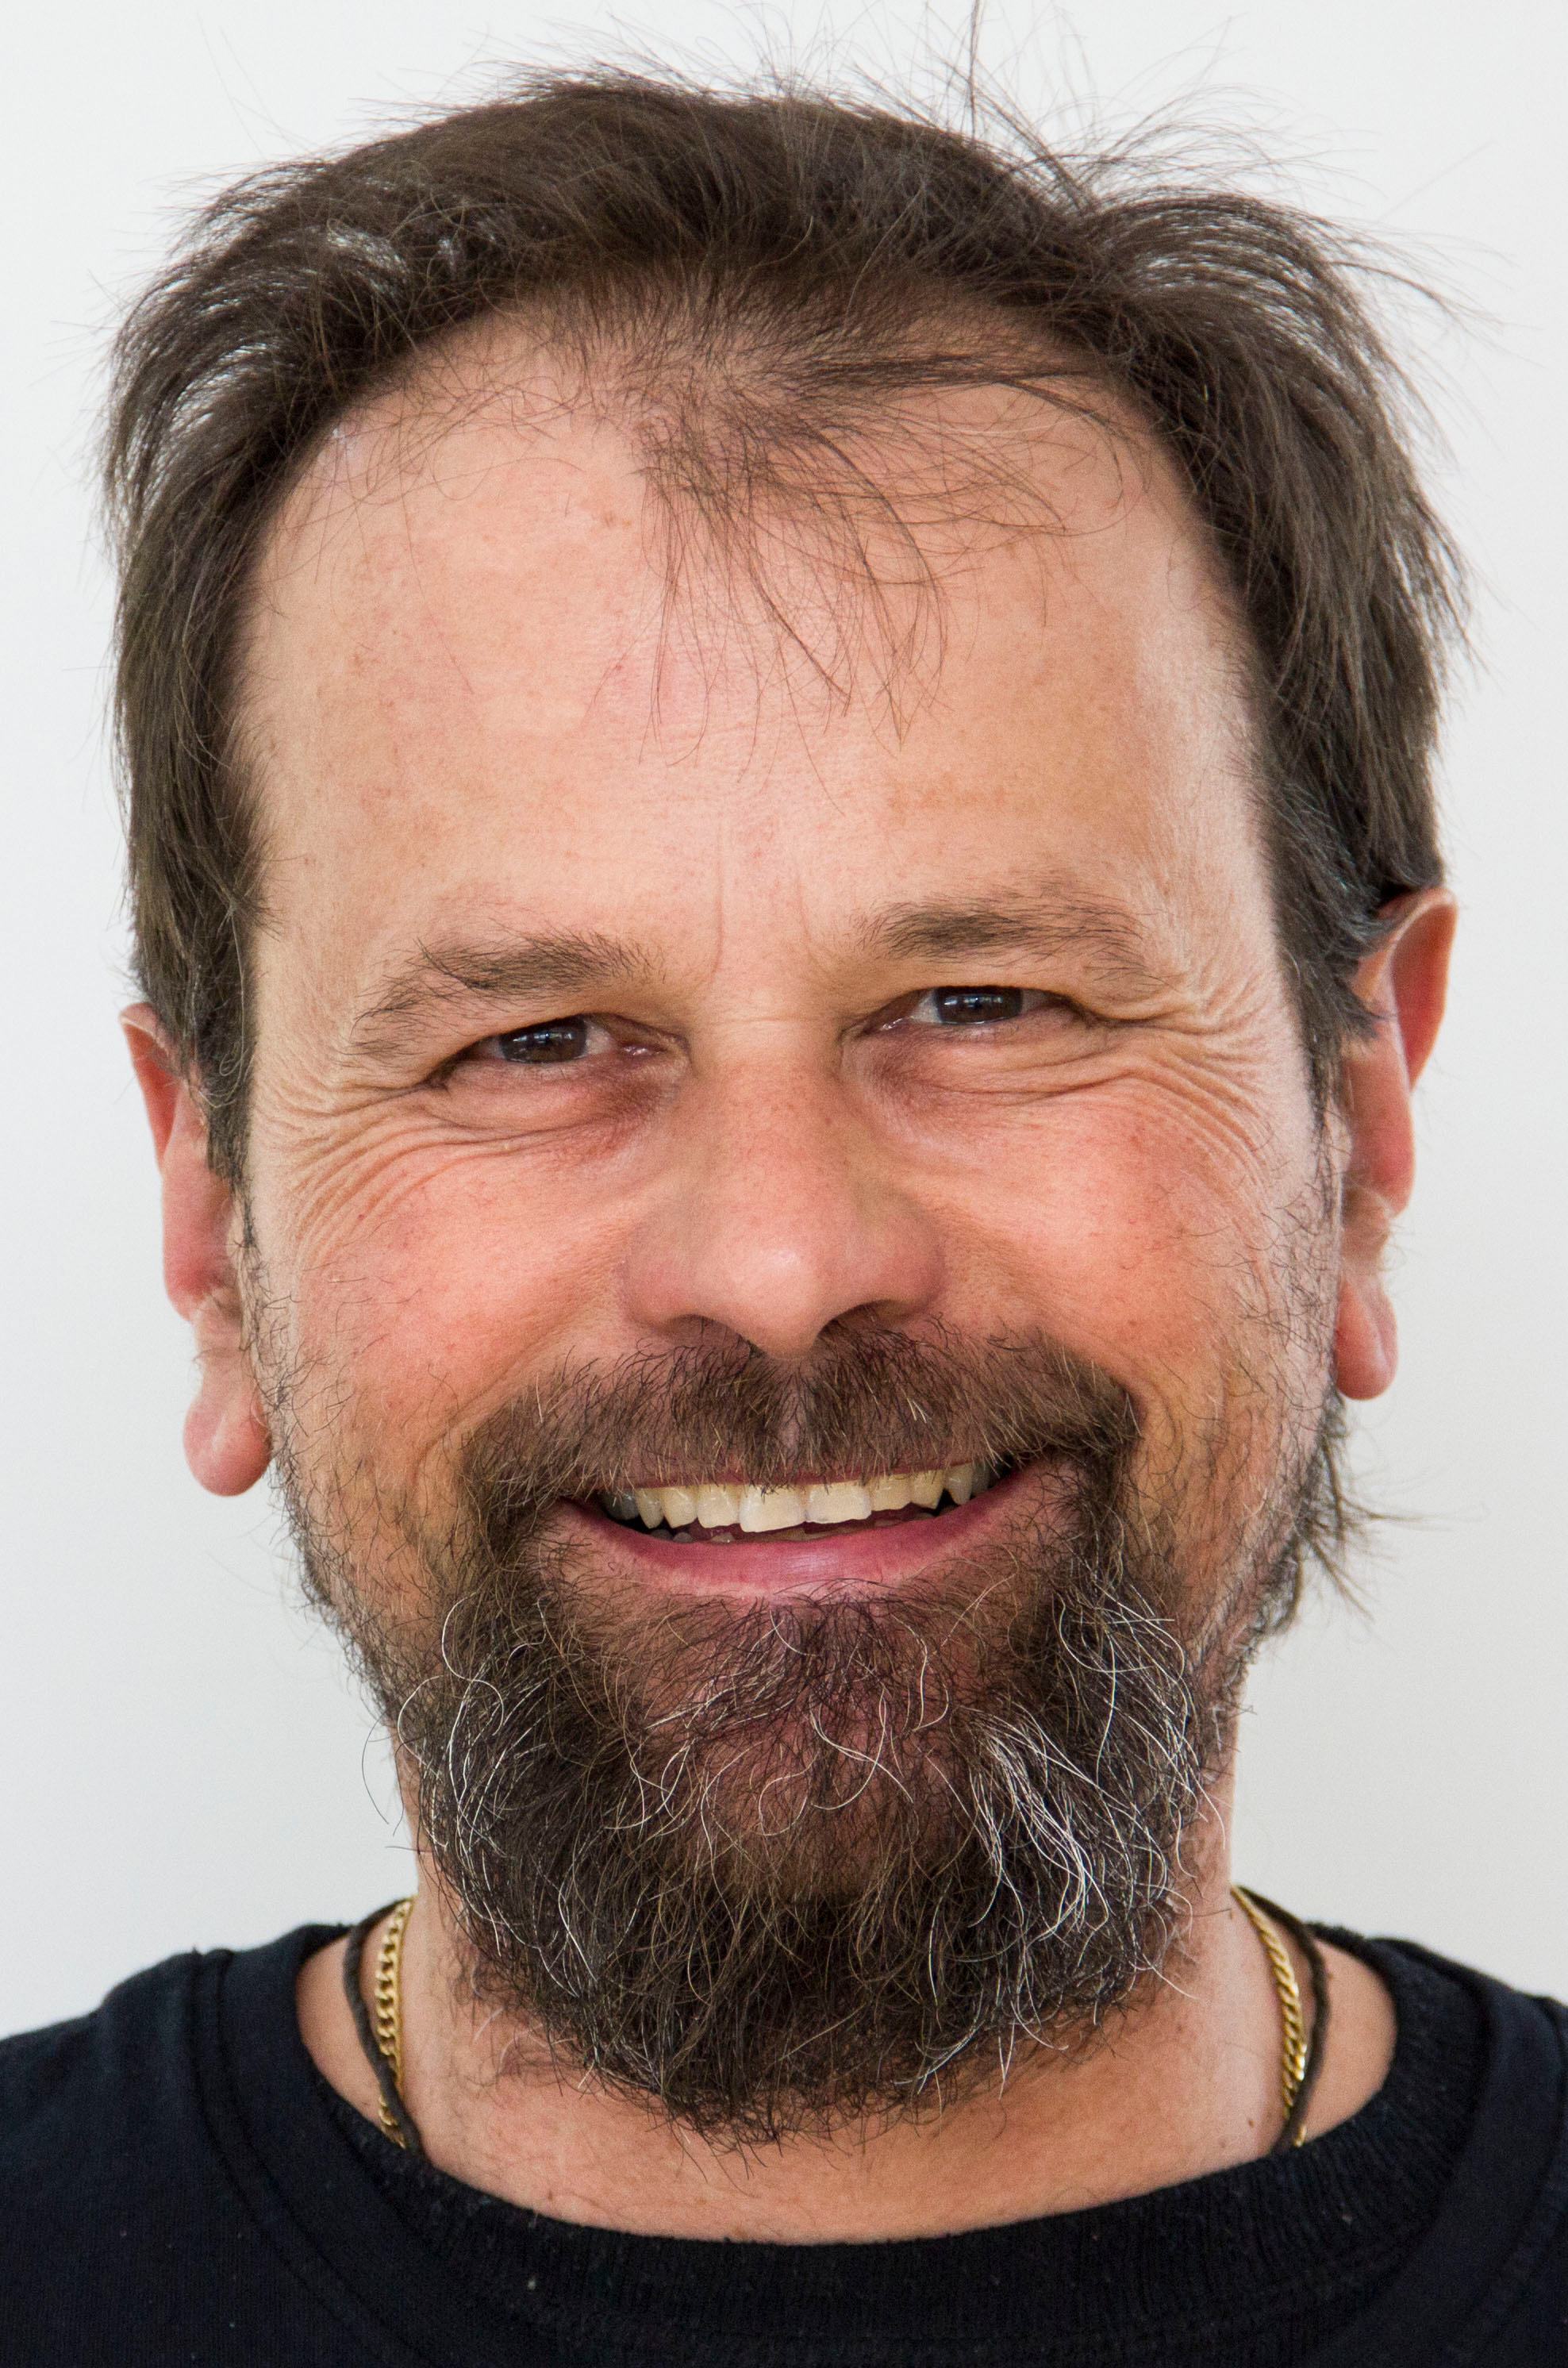 Daniel Heinimann